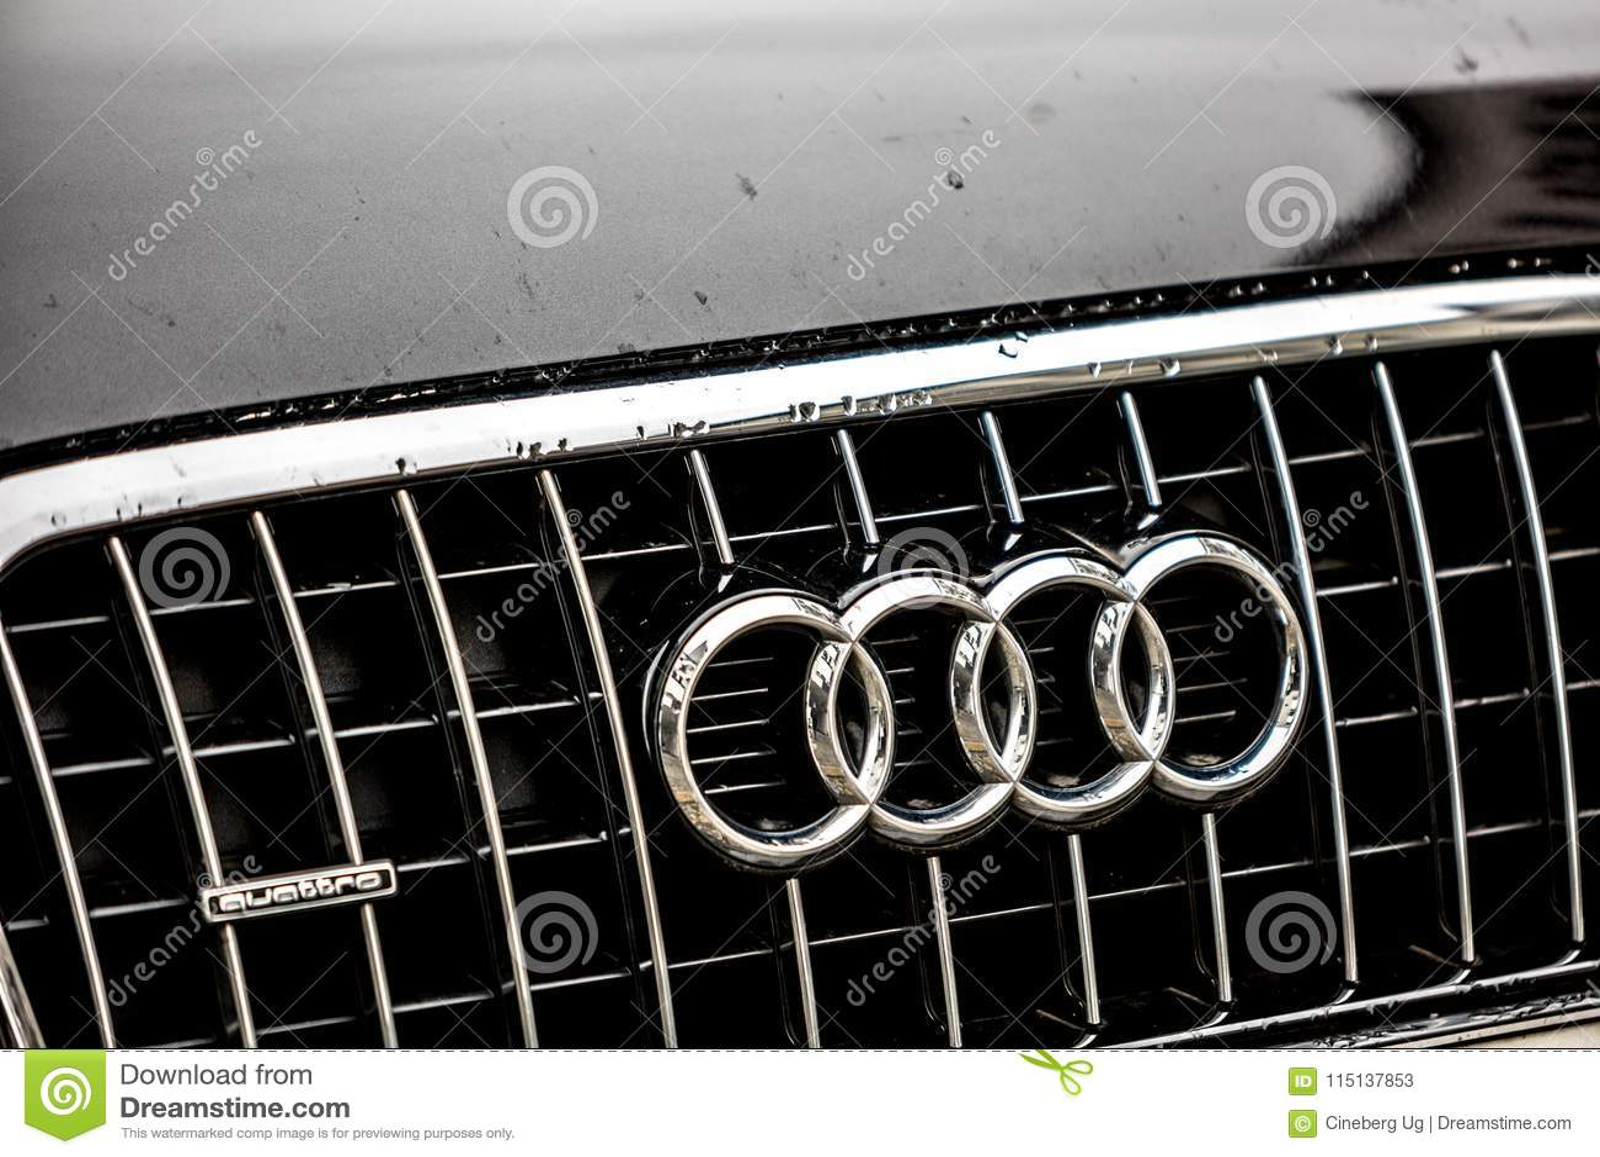 Audi-autoembleem